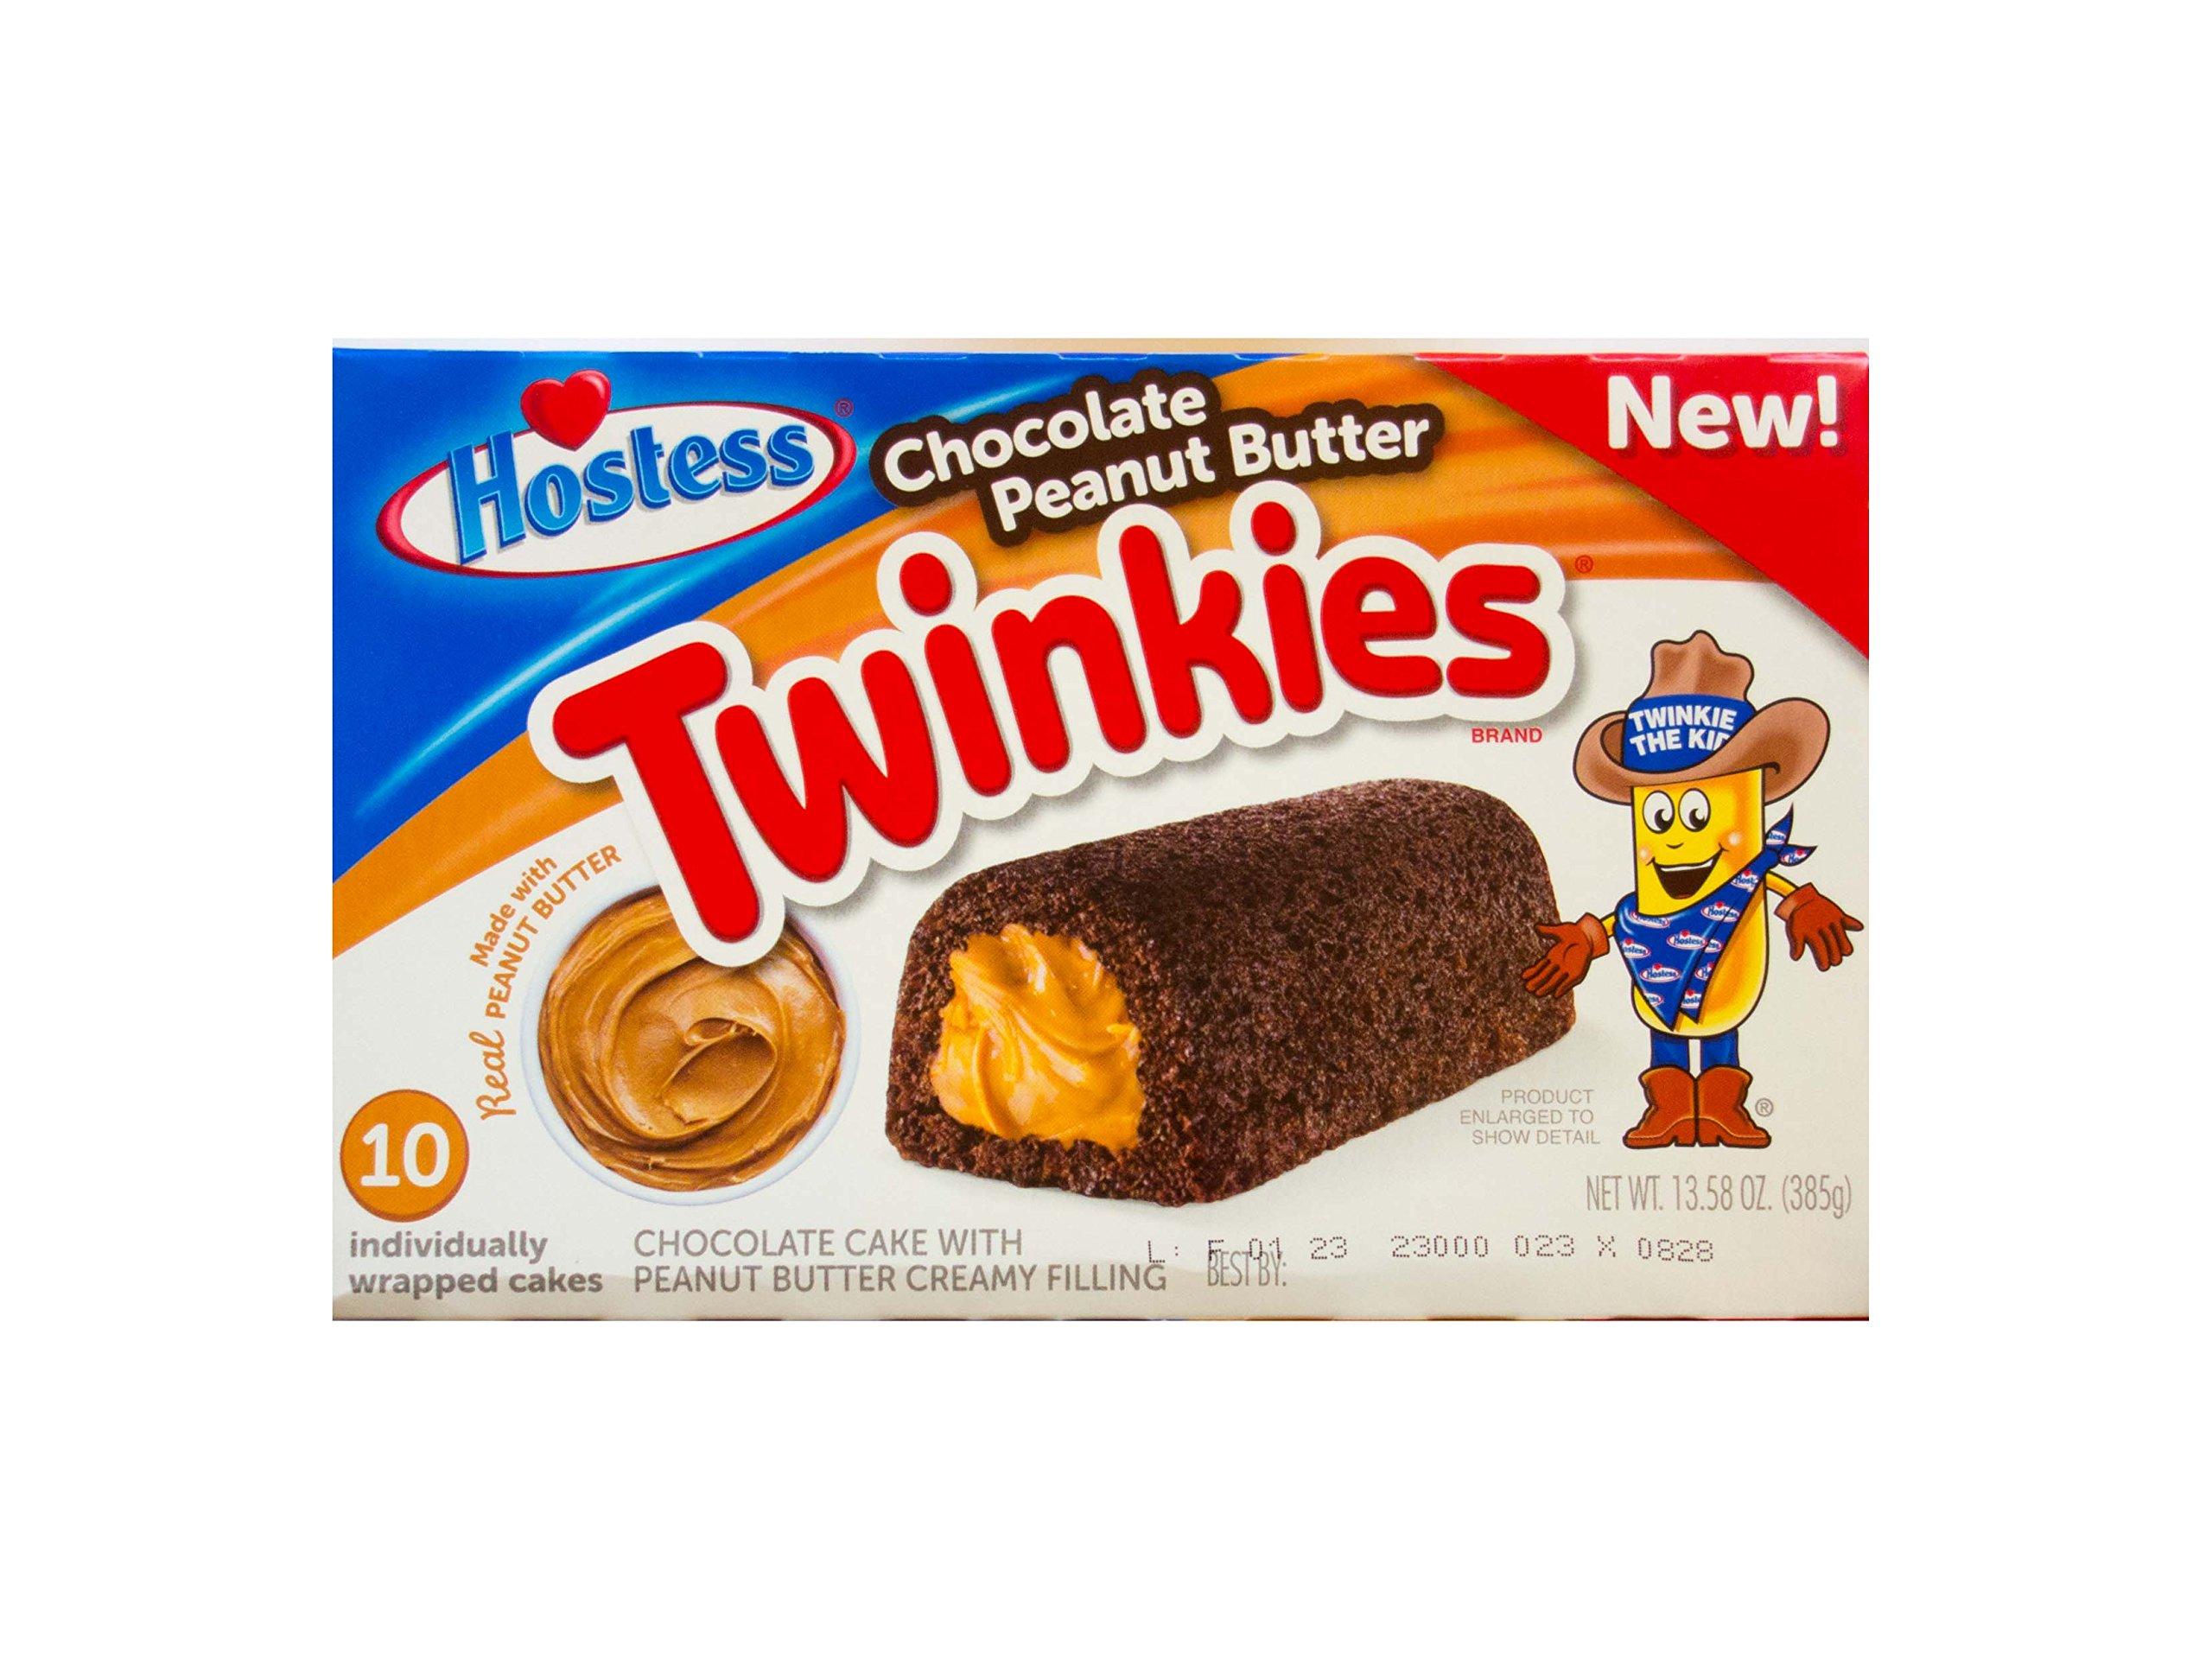 Hostess Chocodile Twinkies (Fudge Covered) 2 Boxes: Amazon